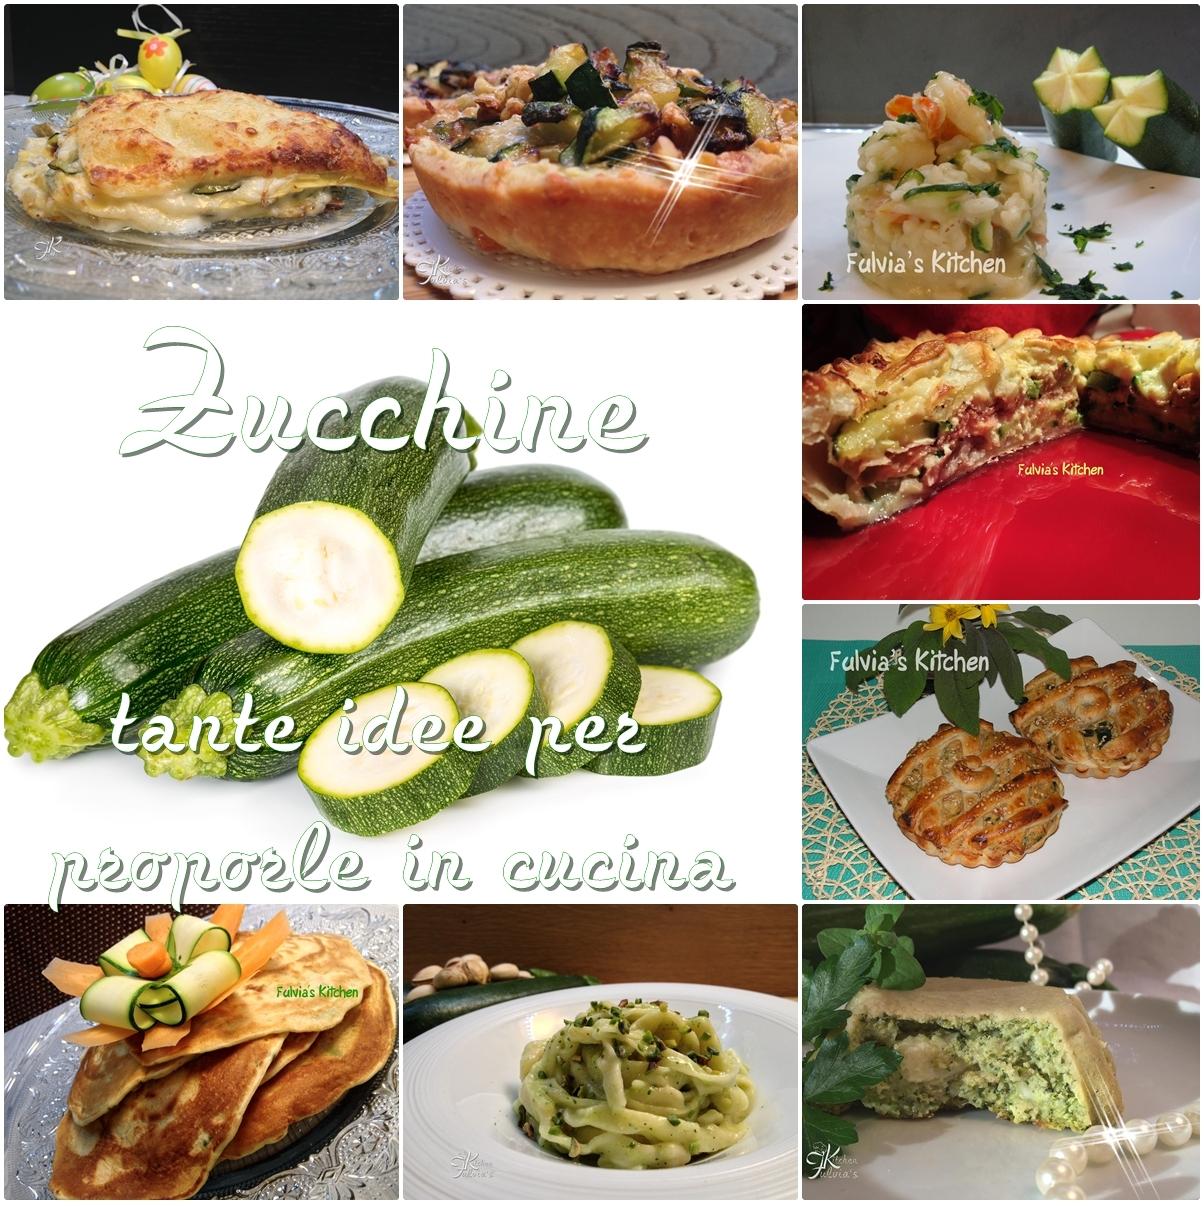 Zucchine: tante idee per proporle in cucina